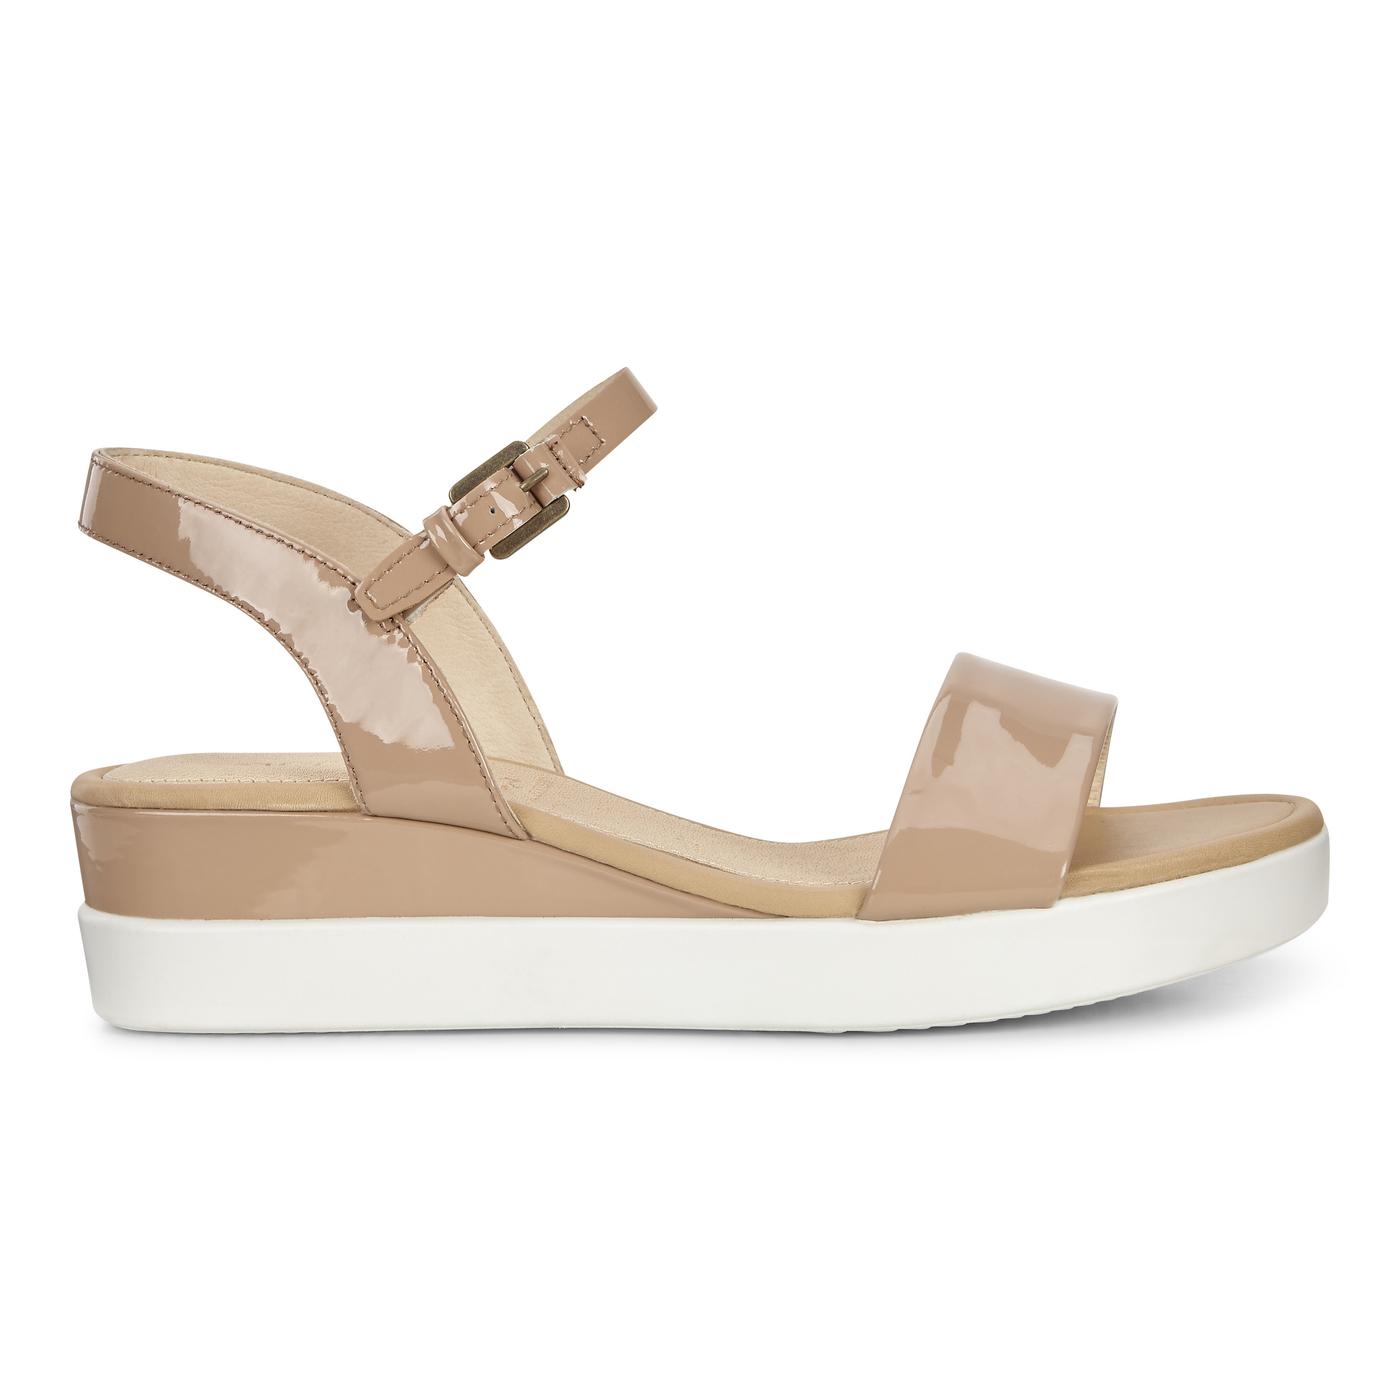 ECCO TOUCH SANDAL PLATEAU Ankle Strap Sandal